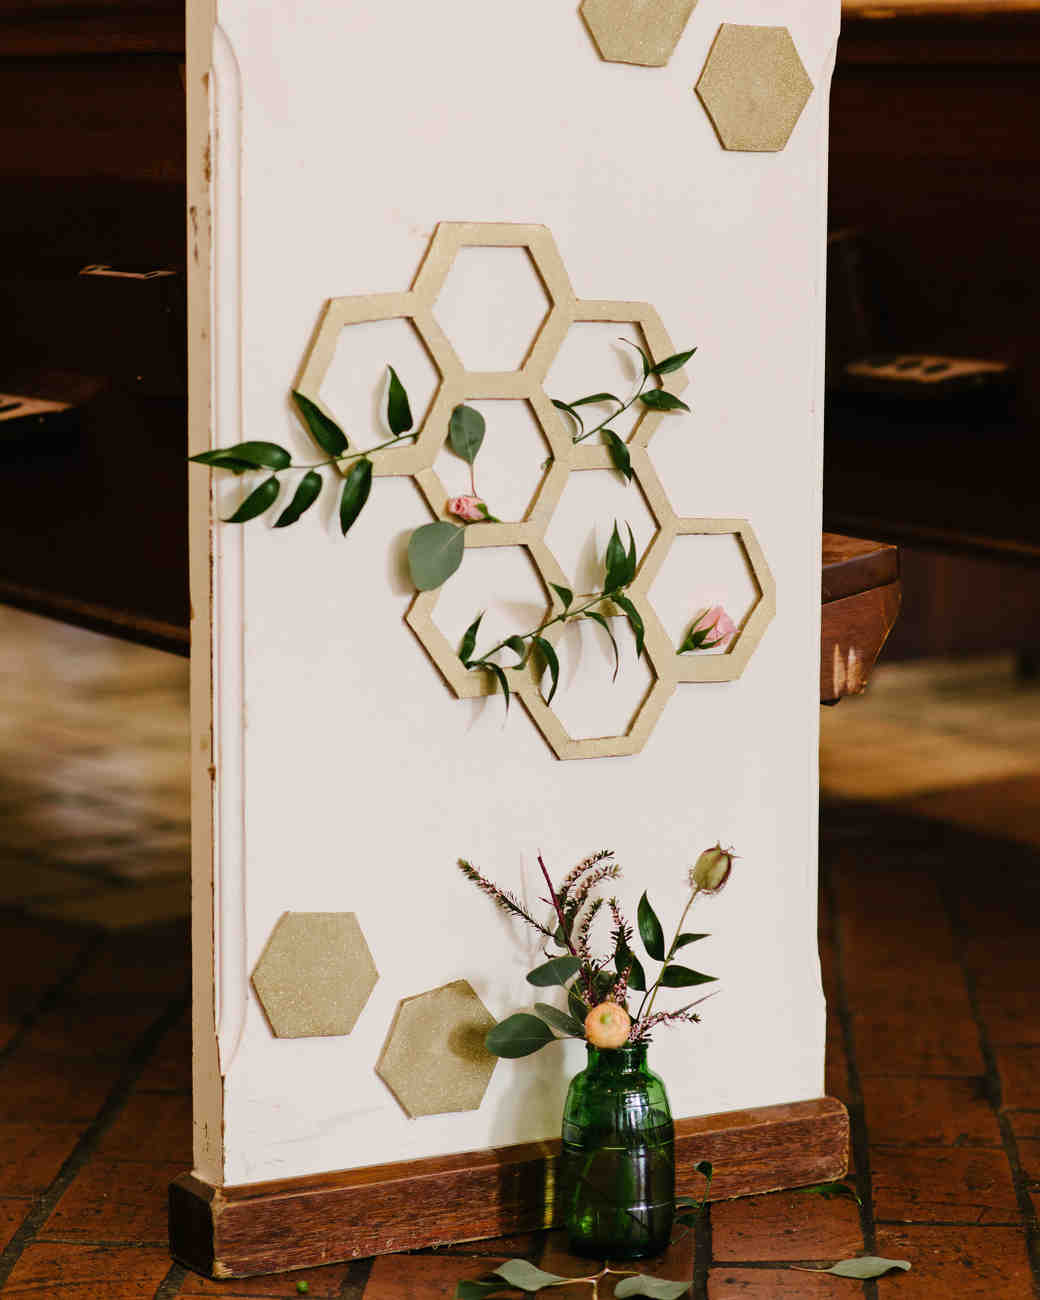 Honeycomb Wedding Inspiration, Honeycomb Pew Decorations at Ceremony